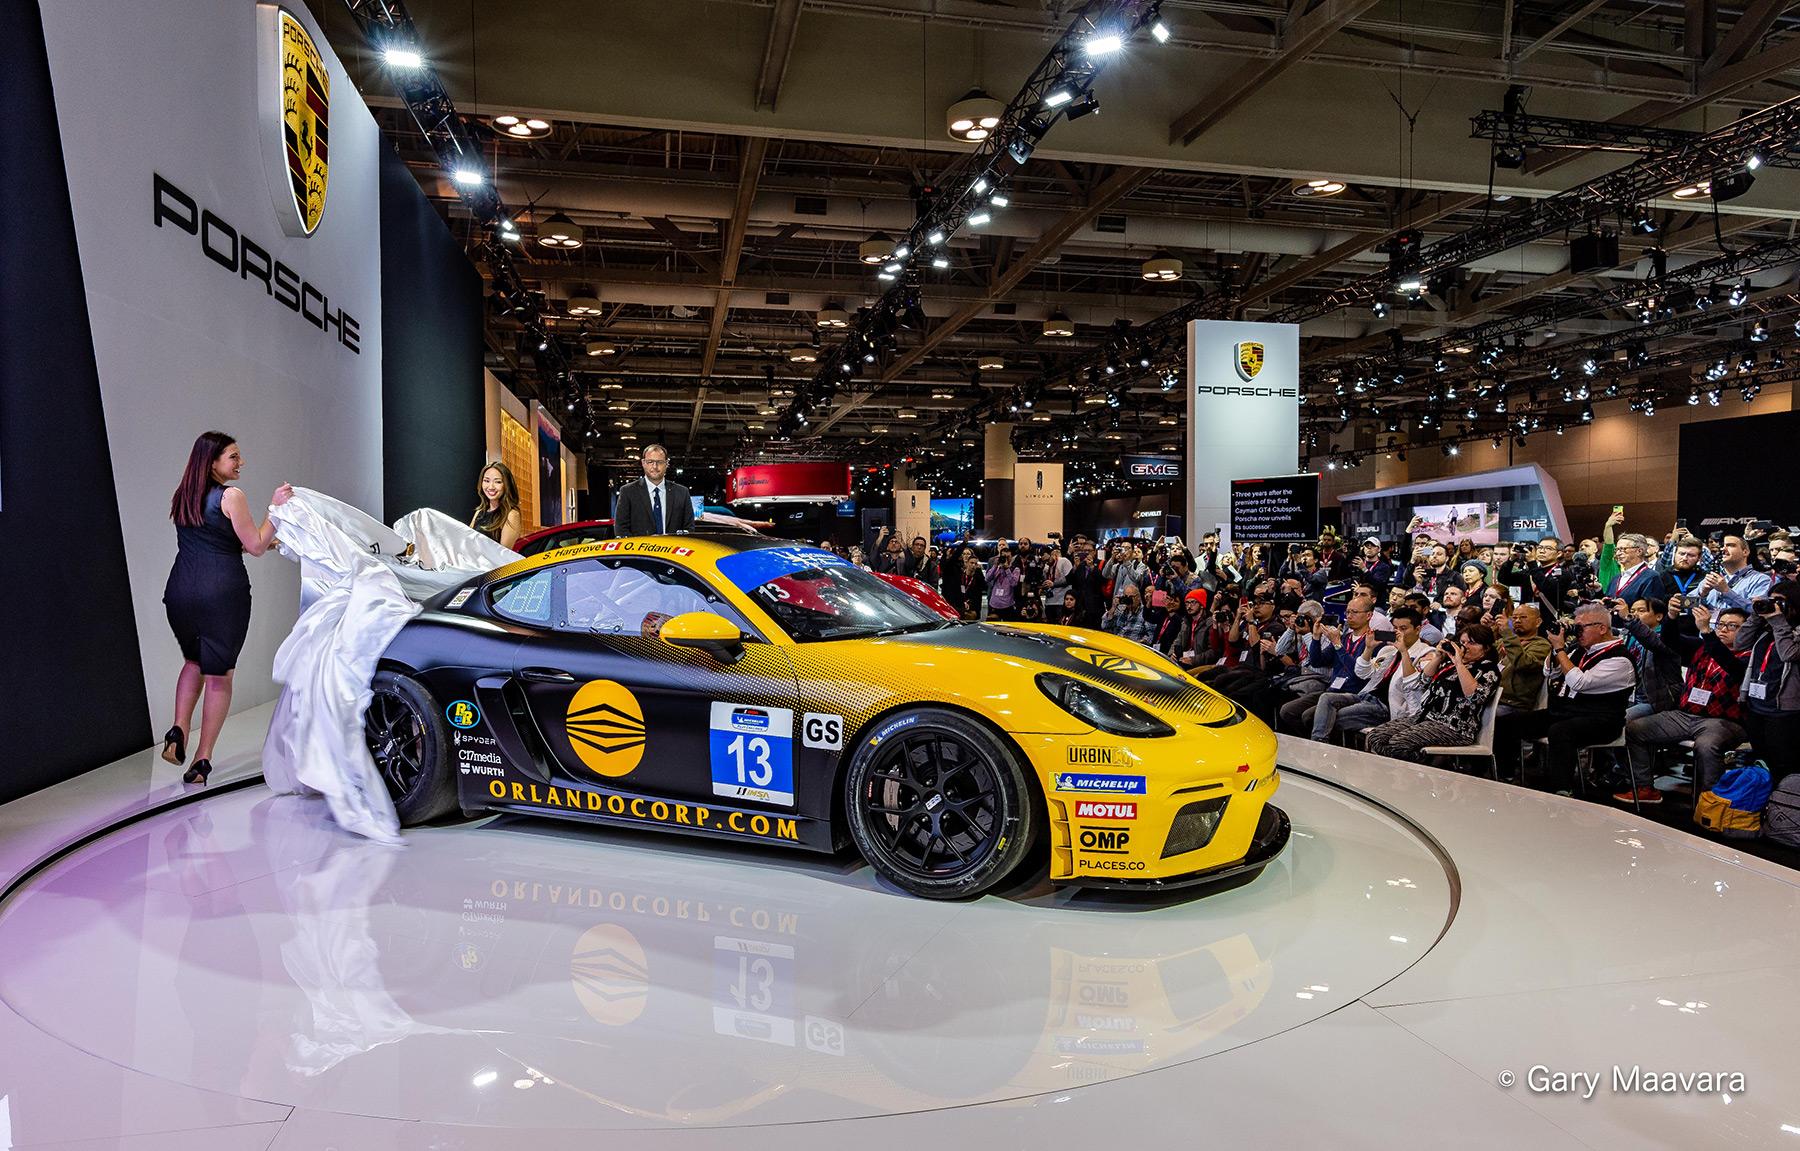 TrackWorthy-CIAS_Porsche-718-Cayman-GT4-Clubsport-21